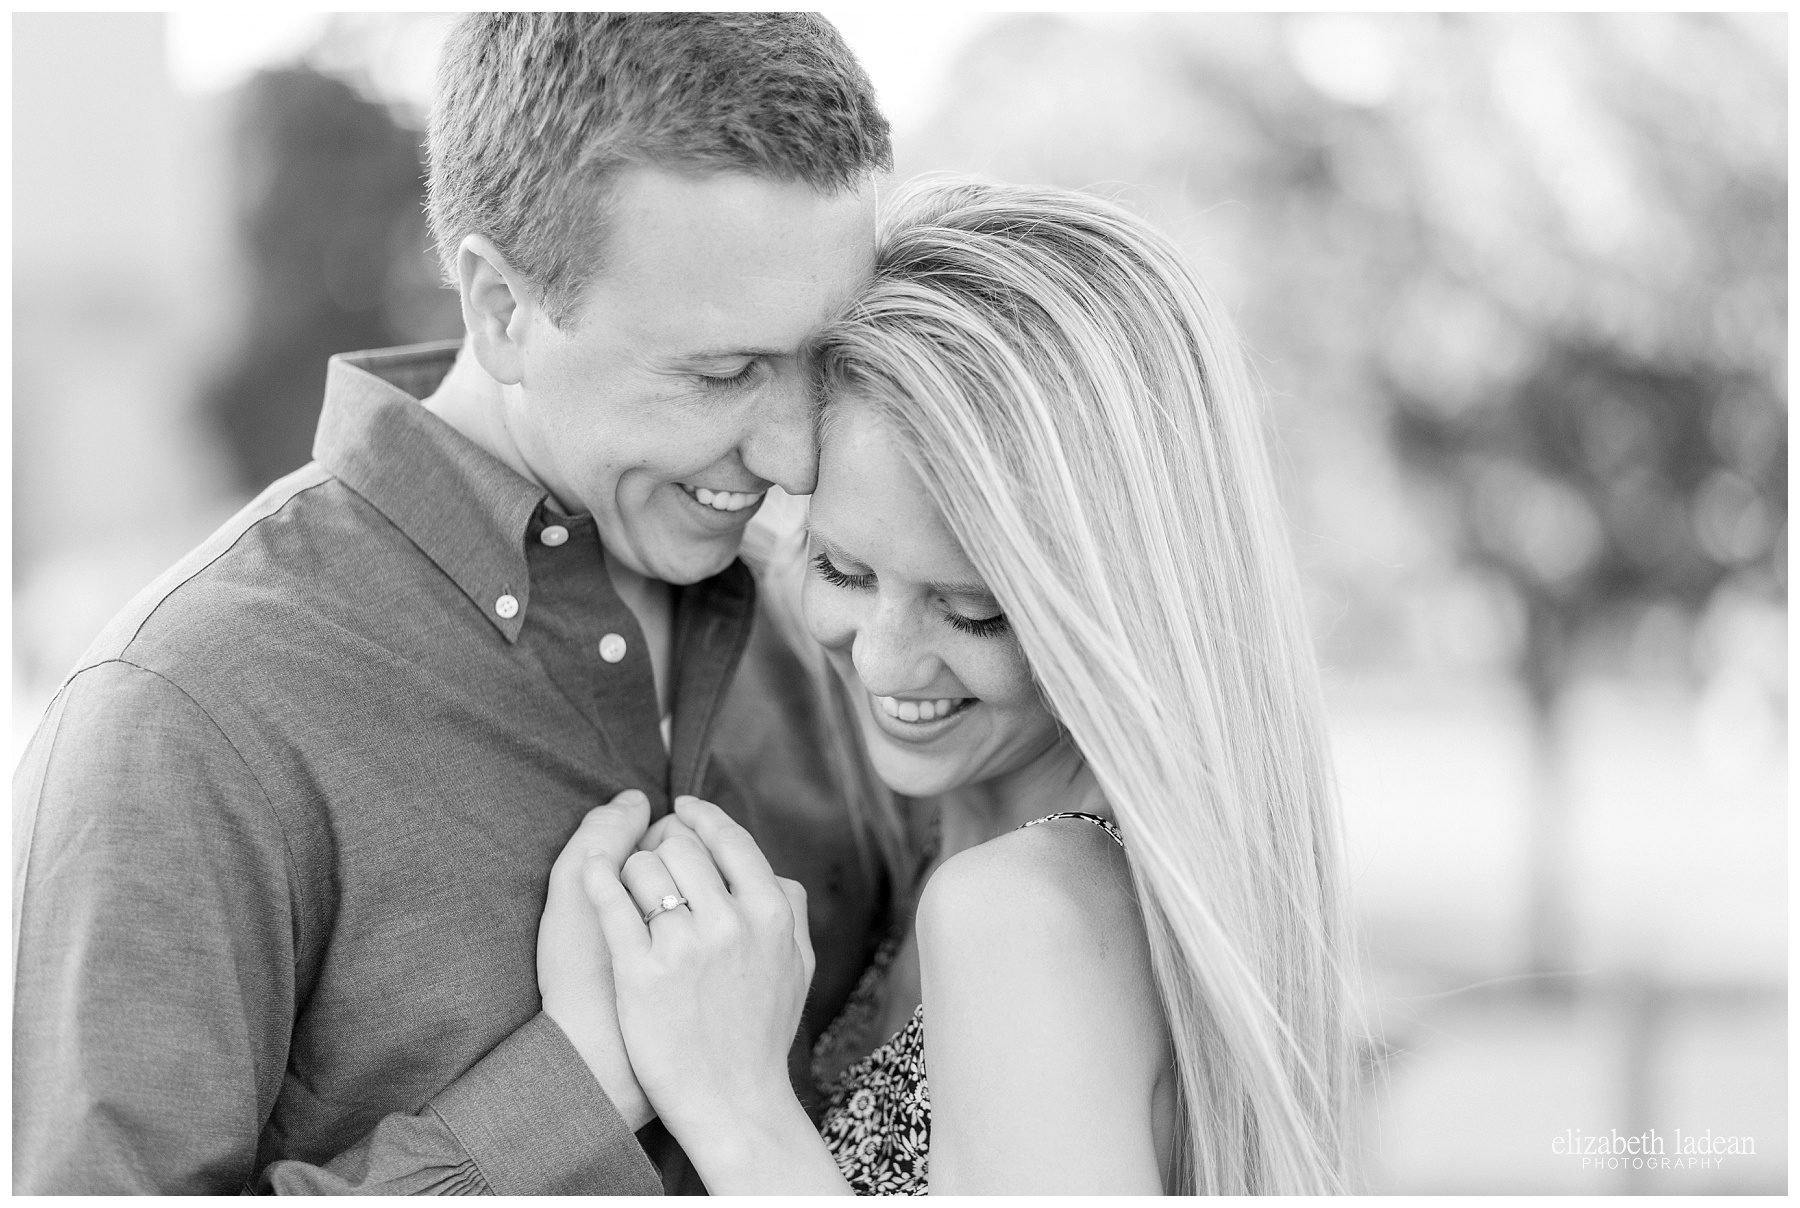 Engagement-Photos-Unity-Village-KC-Photography-A+R-Elizabeth-Ladean-Photography-photo_1381.jpg